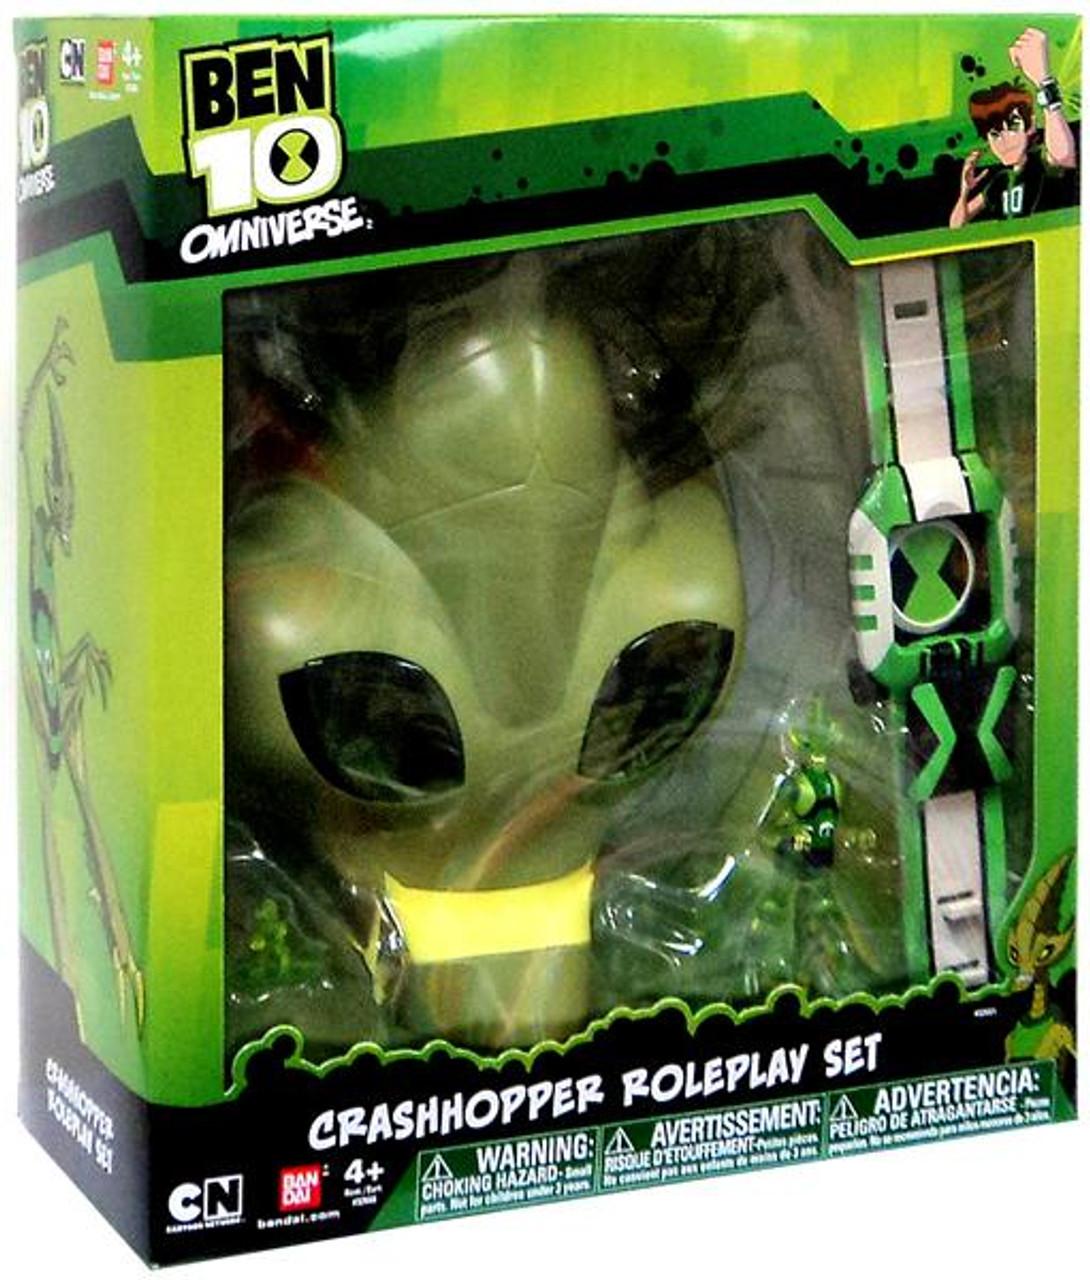 Ben 10 Omniverse Crashhopper Roleplay Set Roleplay Toy